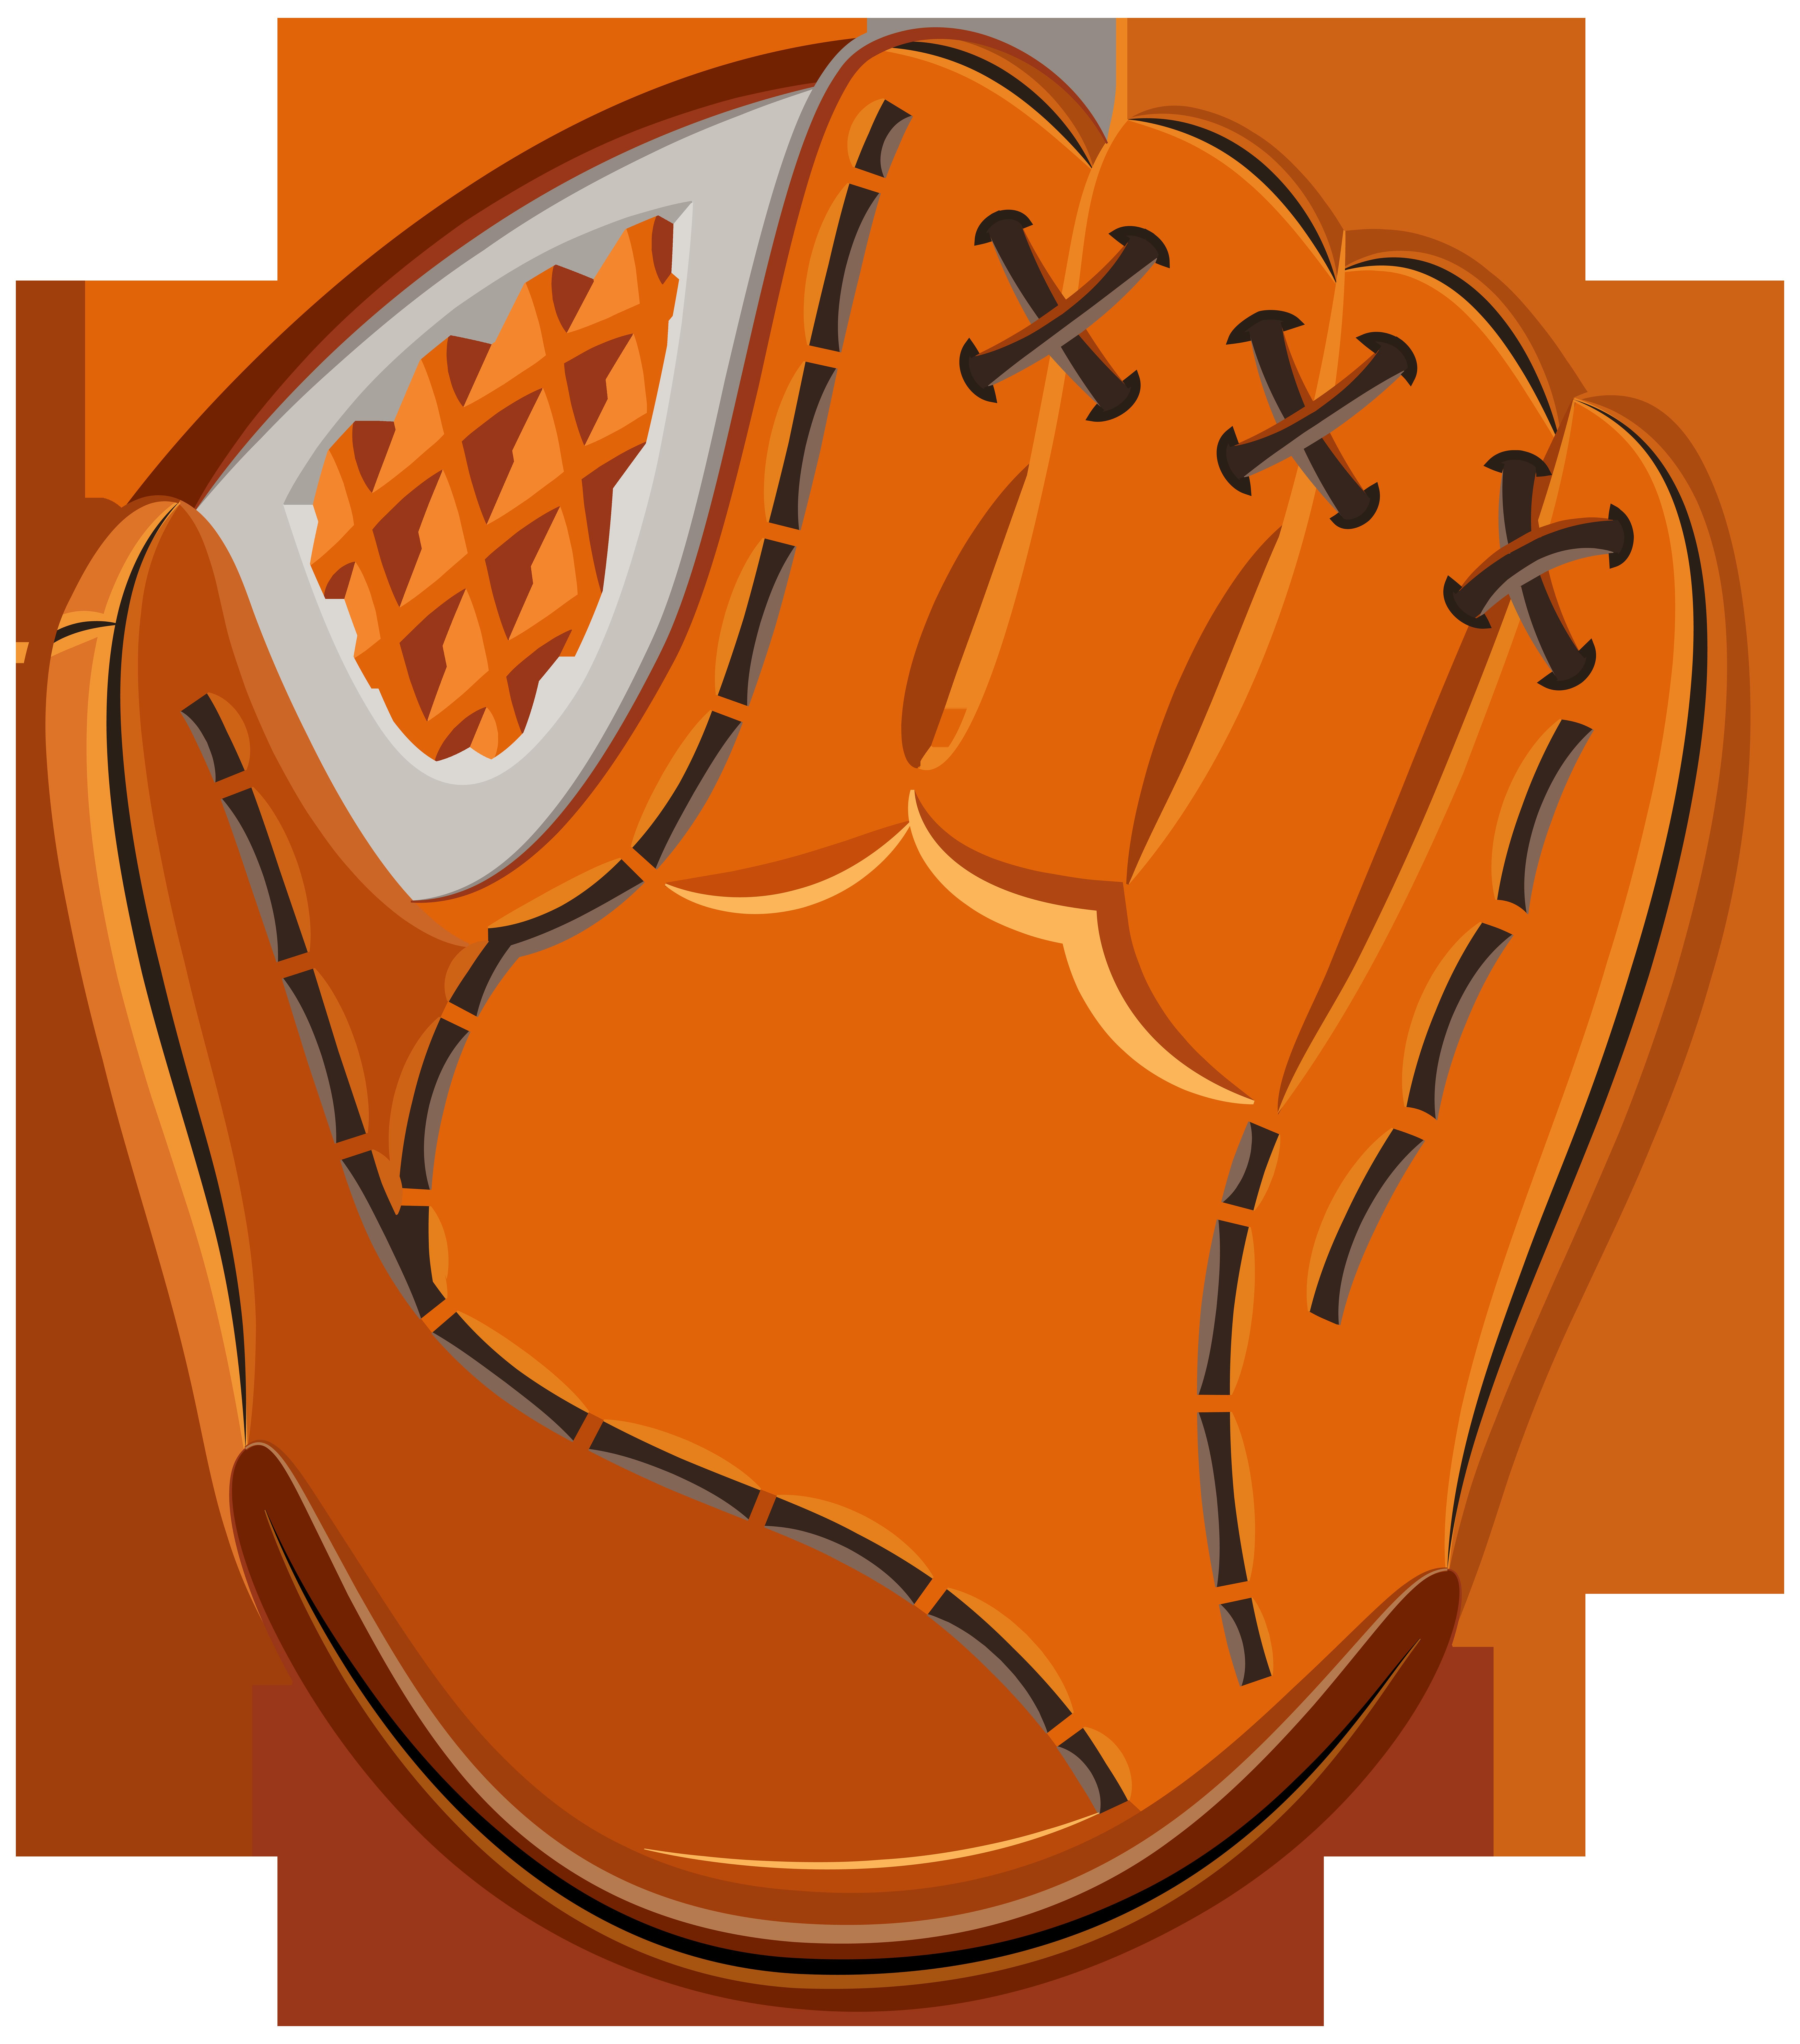 Baseball Glove PNG Clip Art Image.